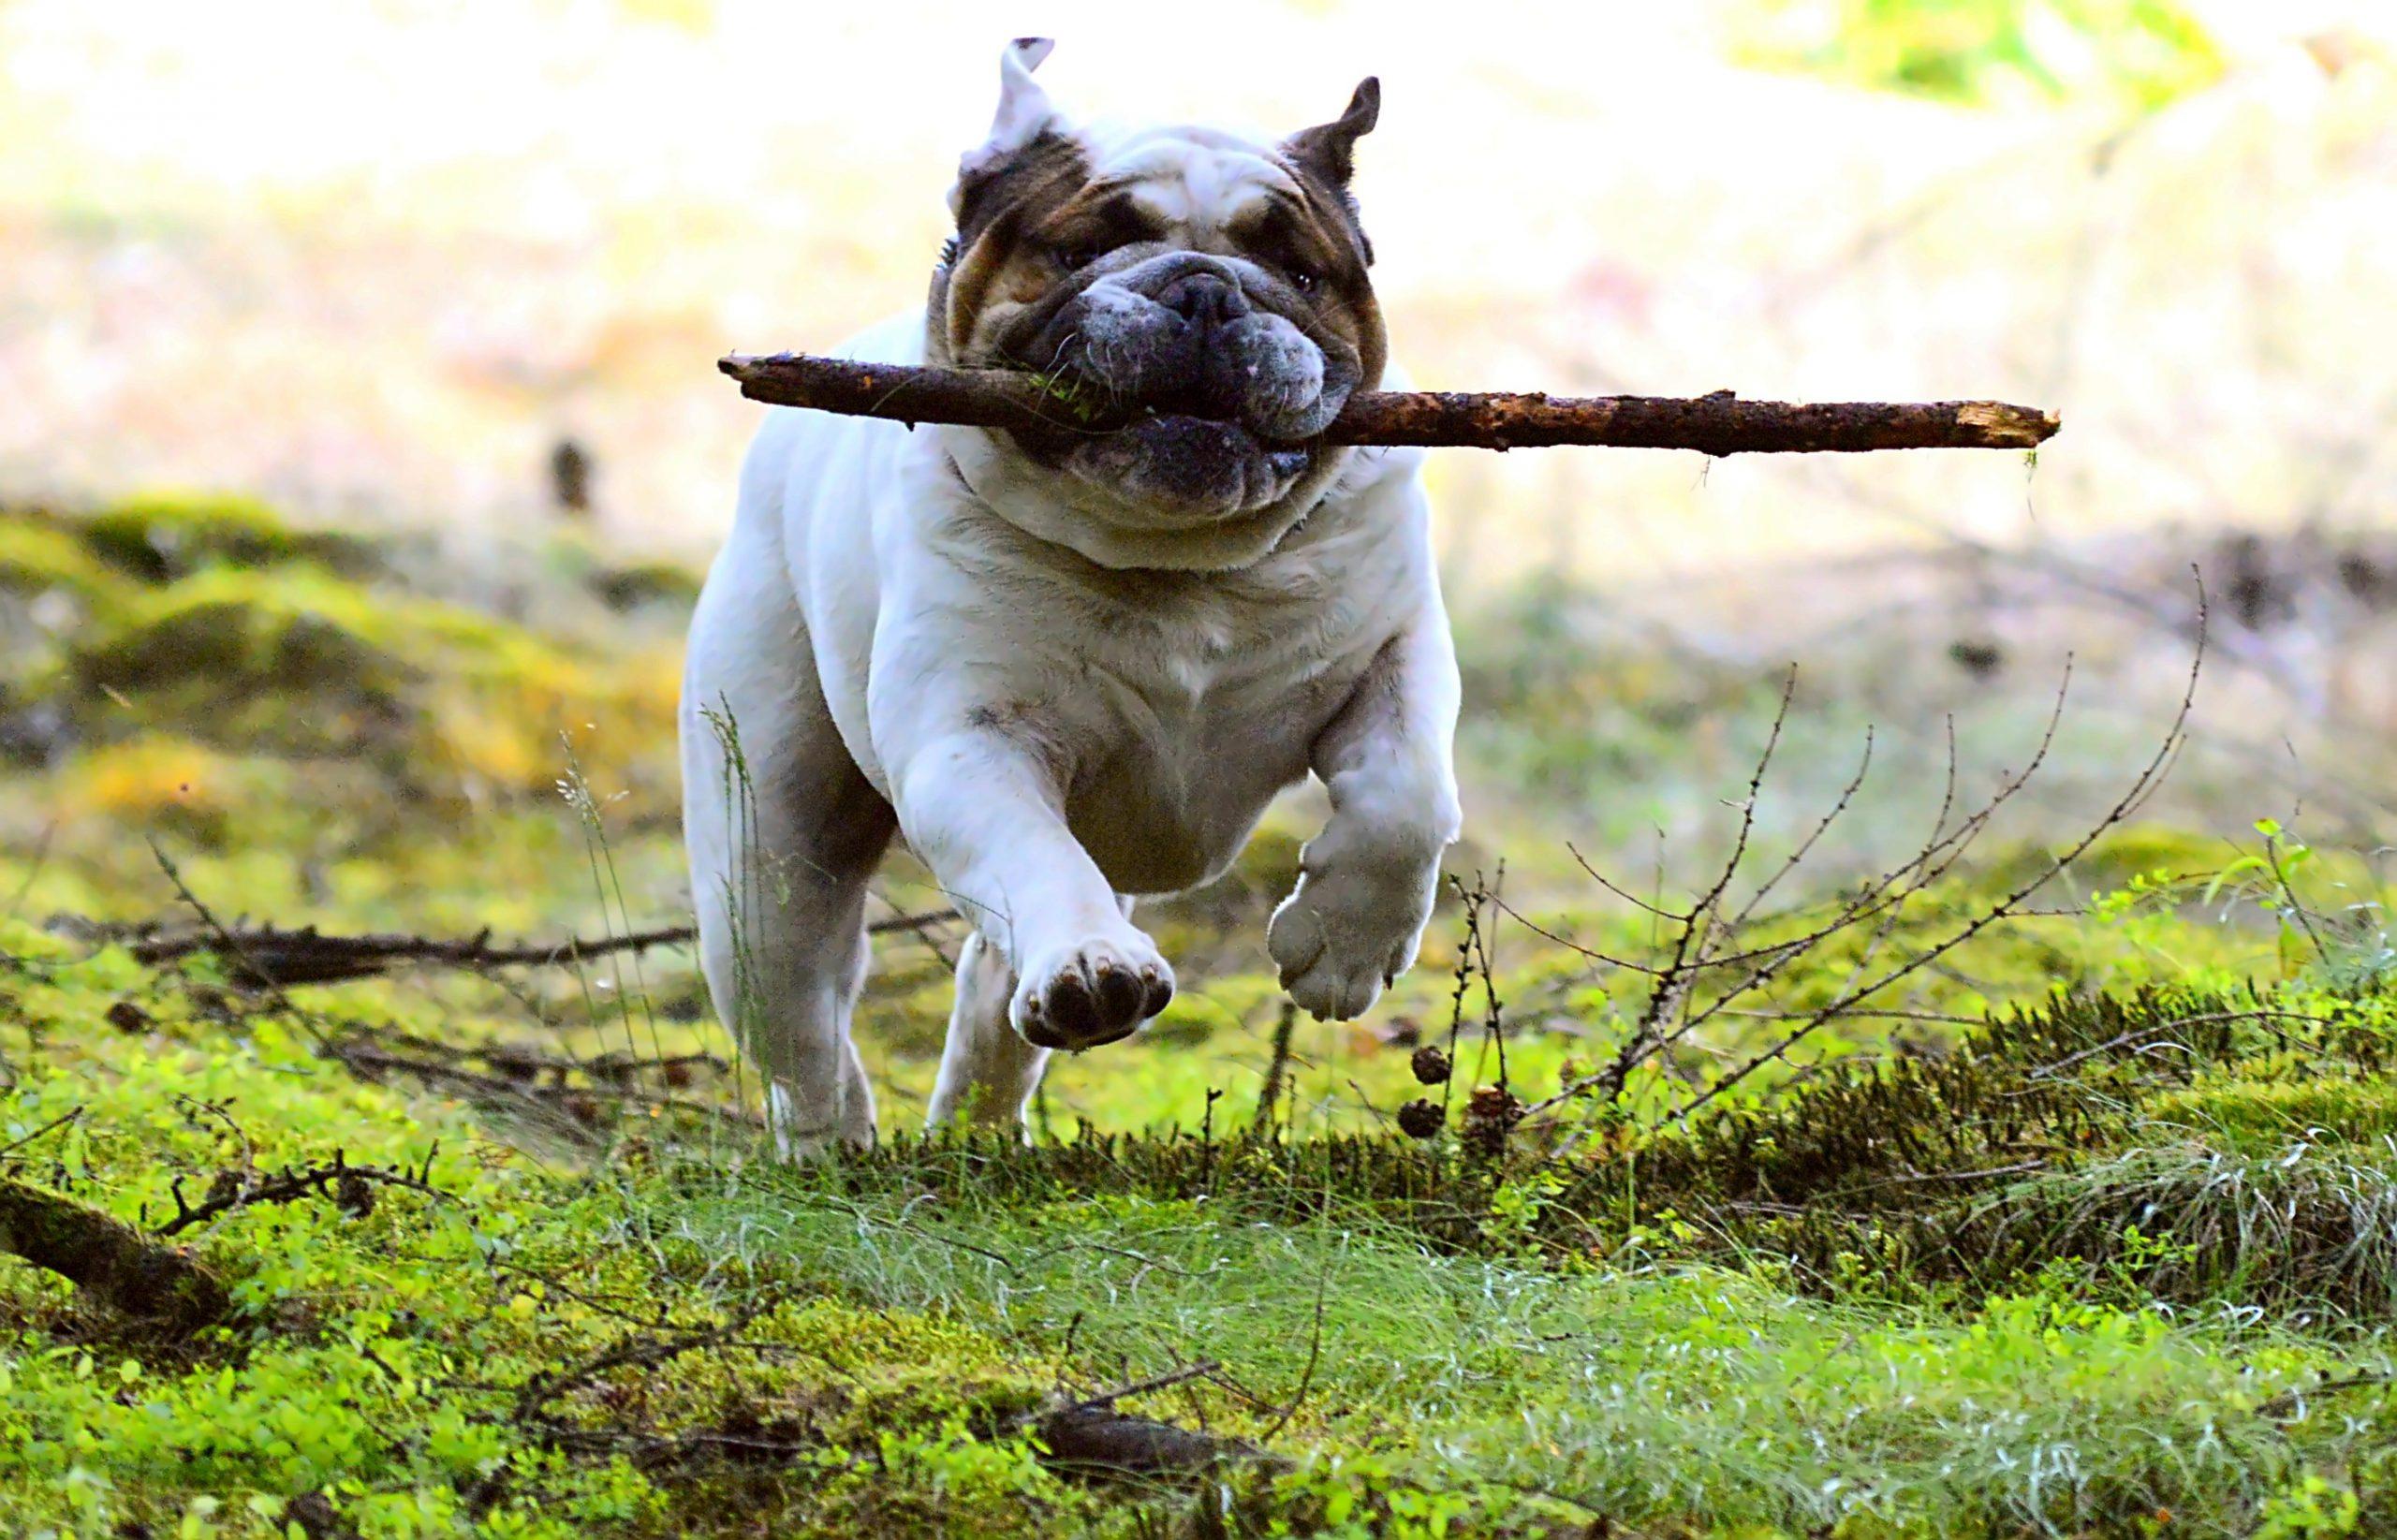 bulldog running with stick